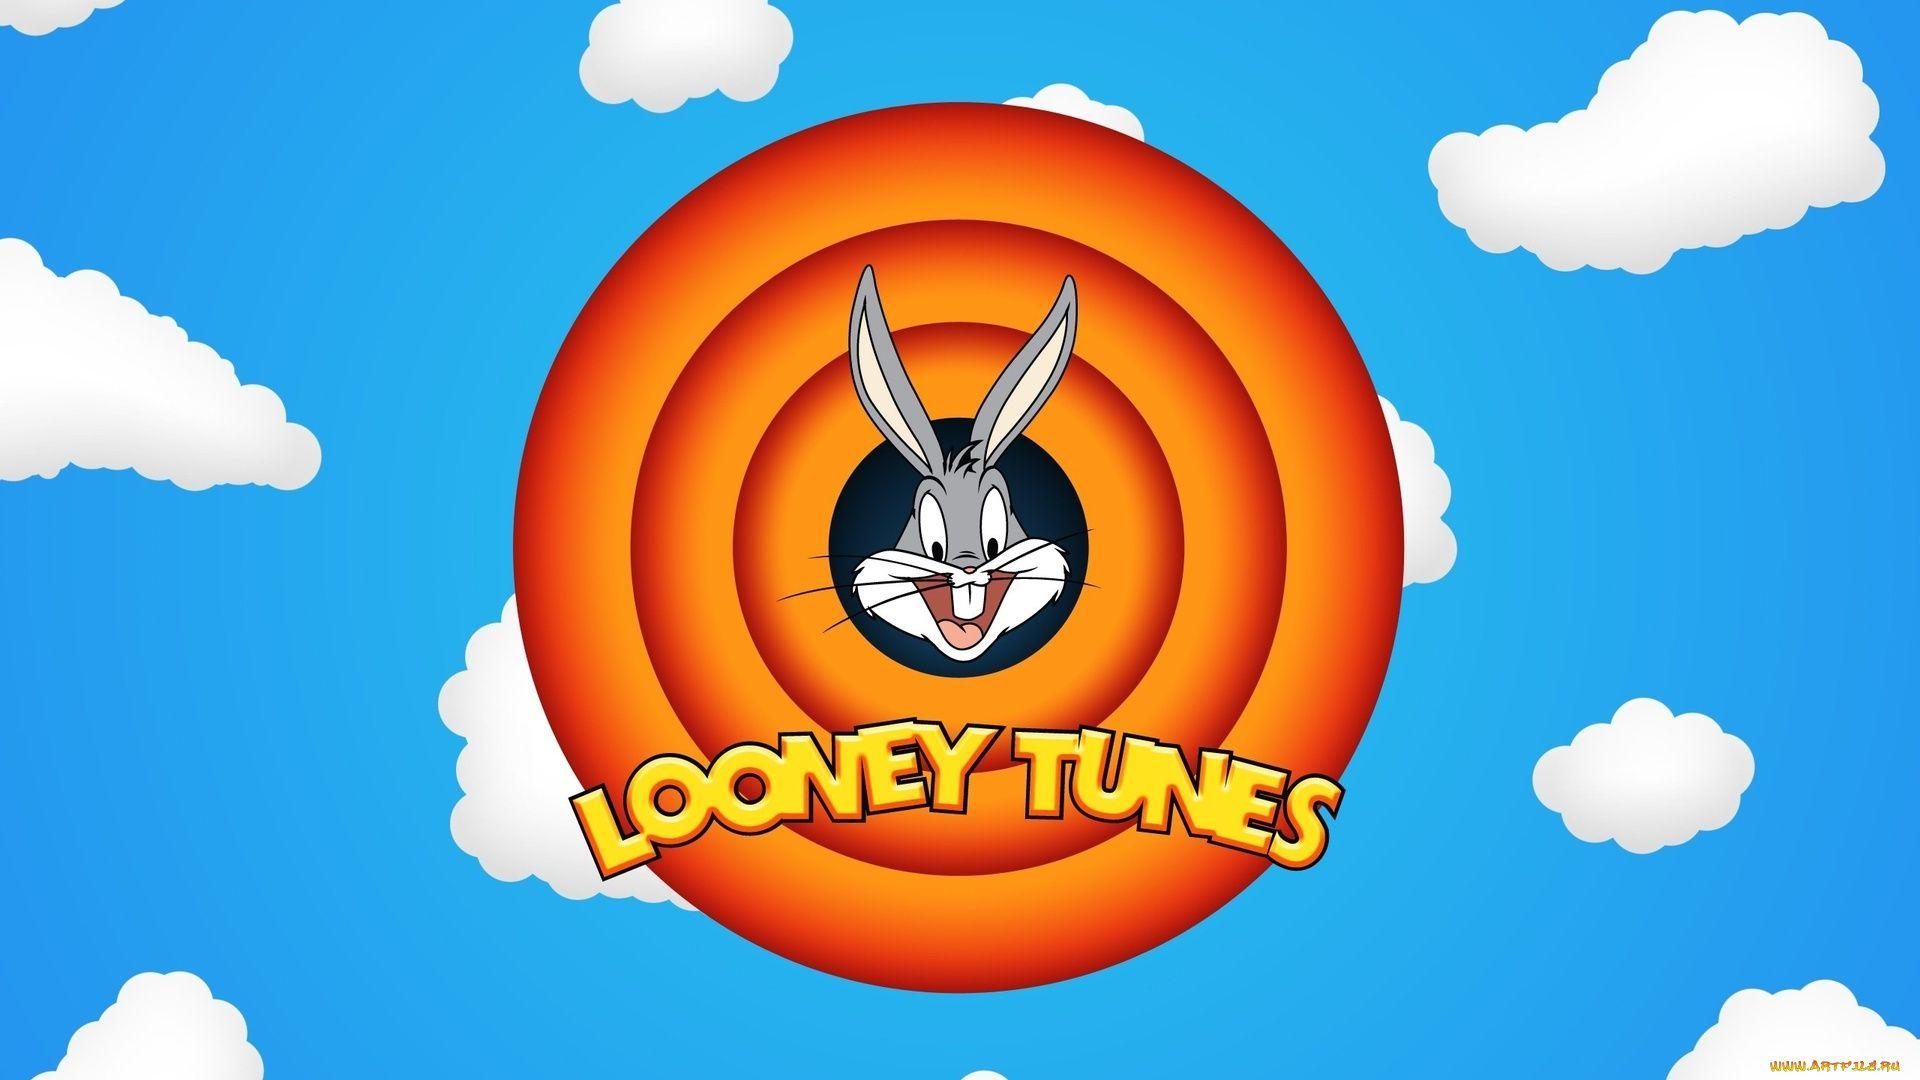 Looney Tunes full hd wallpaper for laptop